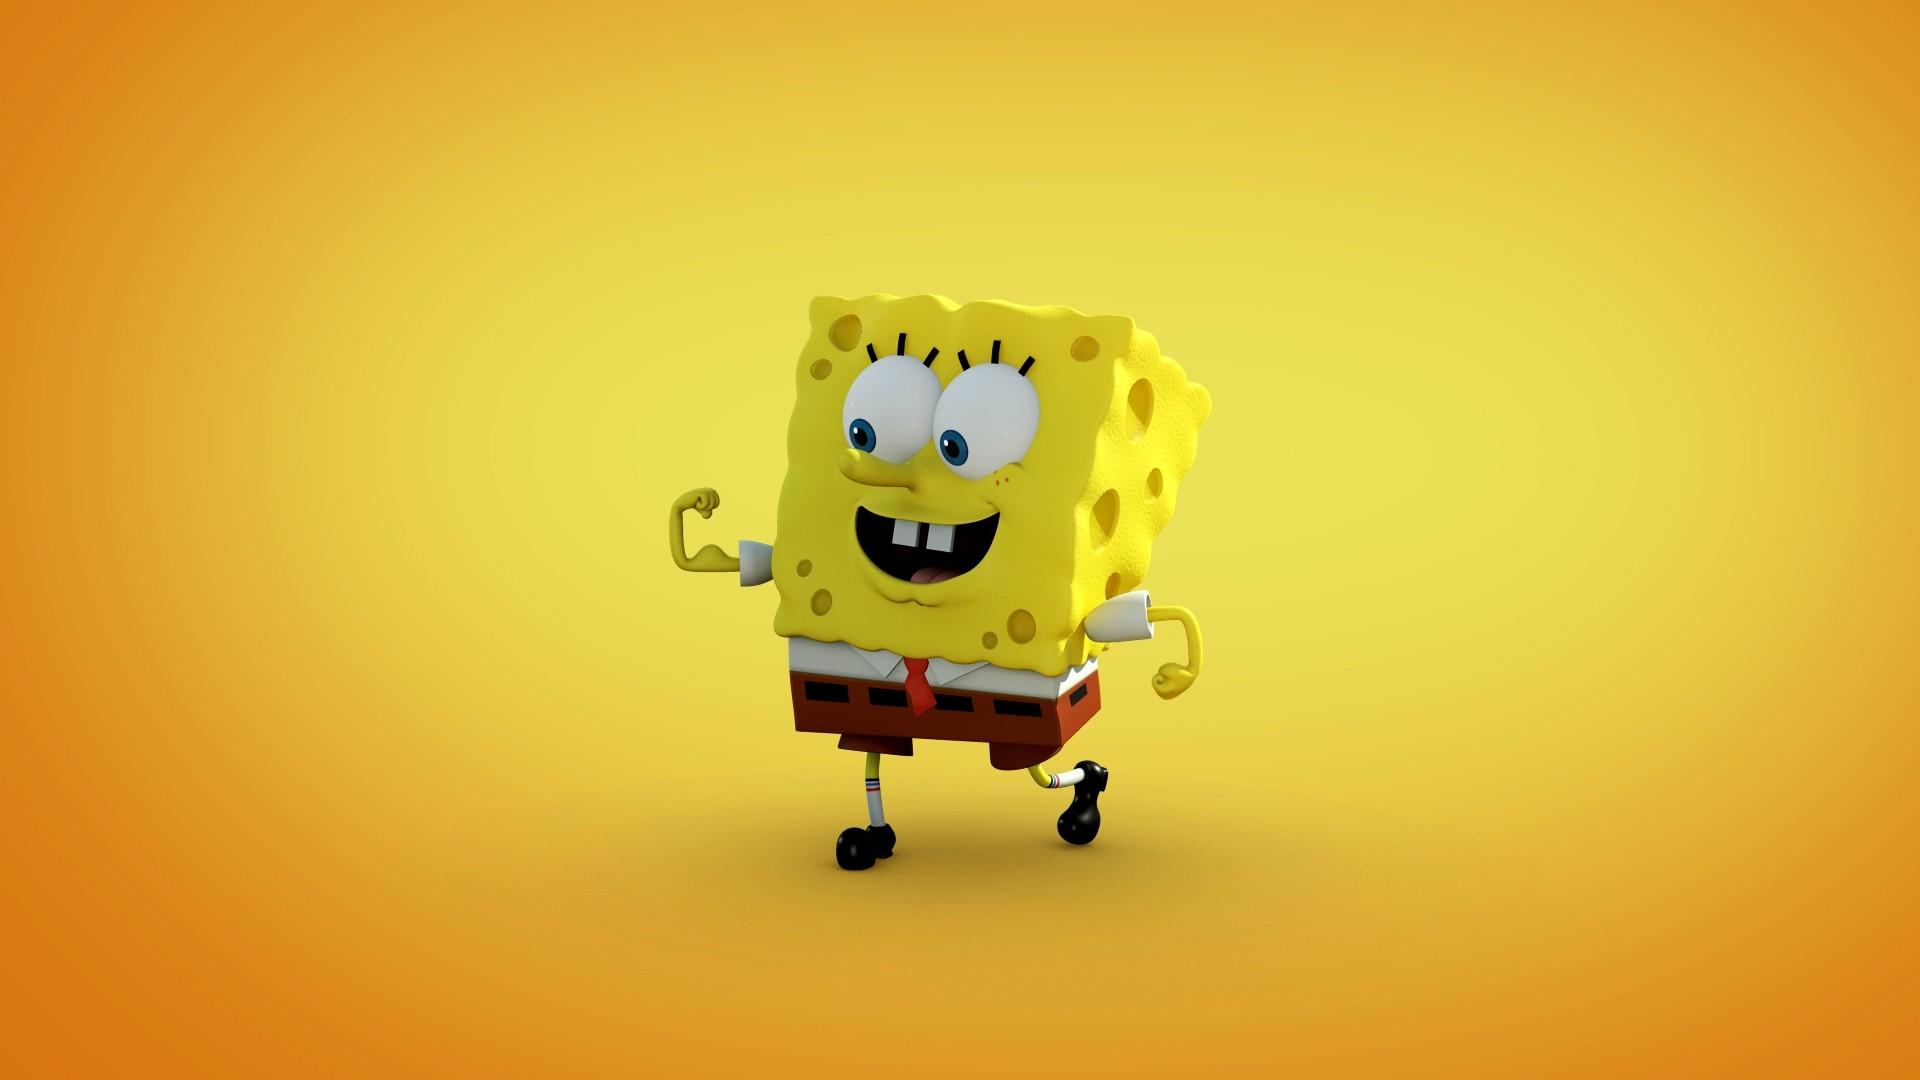 Spongebob Desktop Wallpaper Posted By Ryan Tremblay